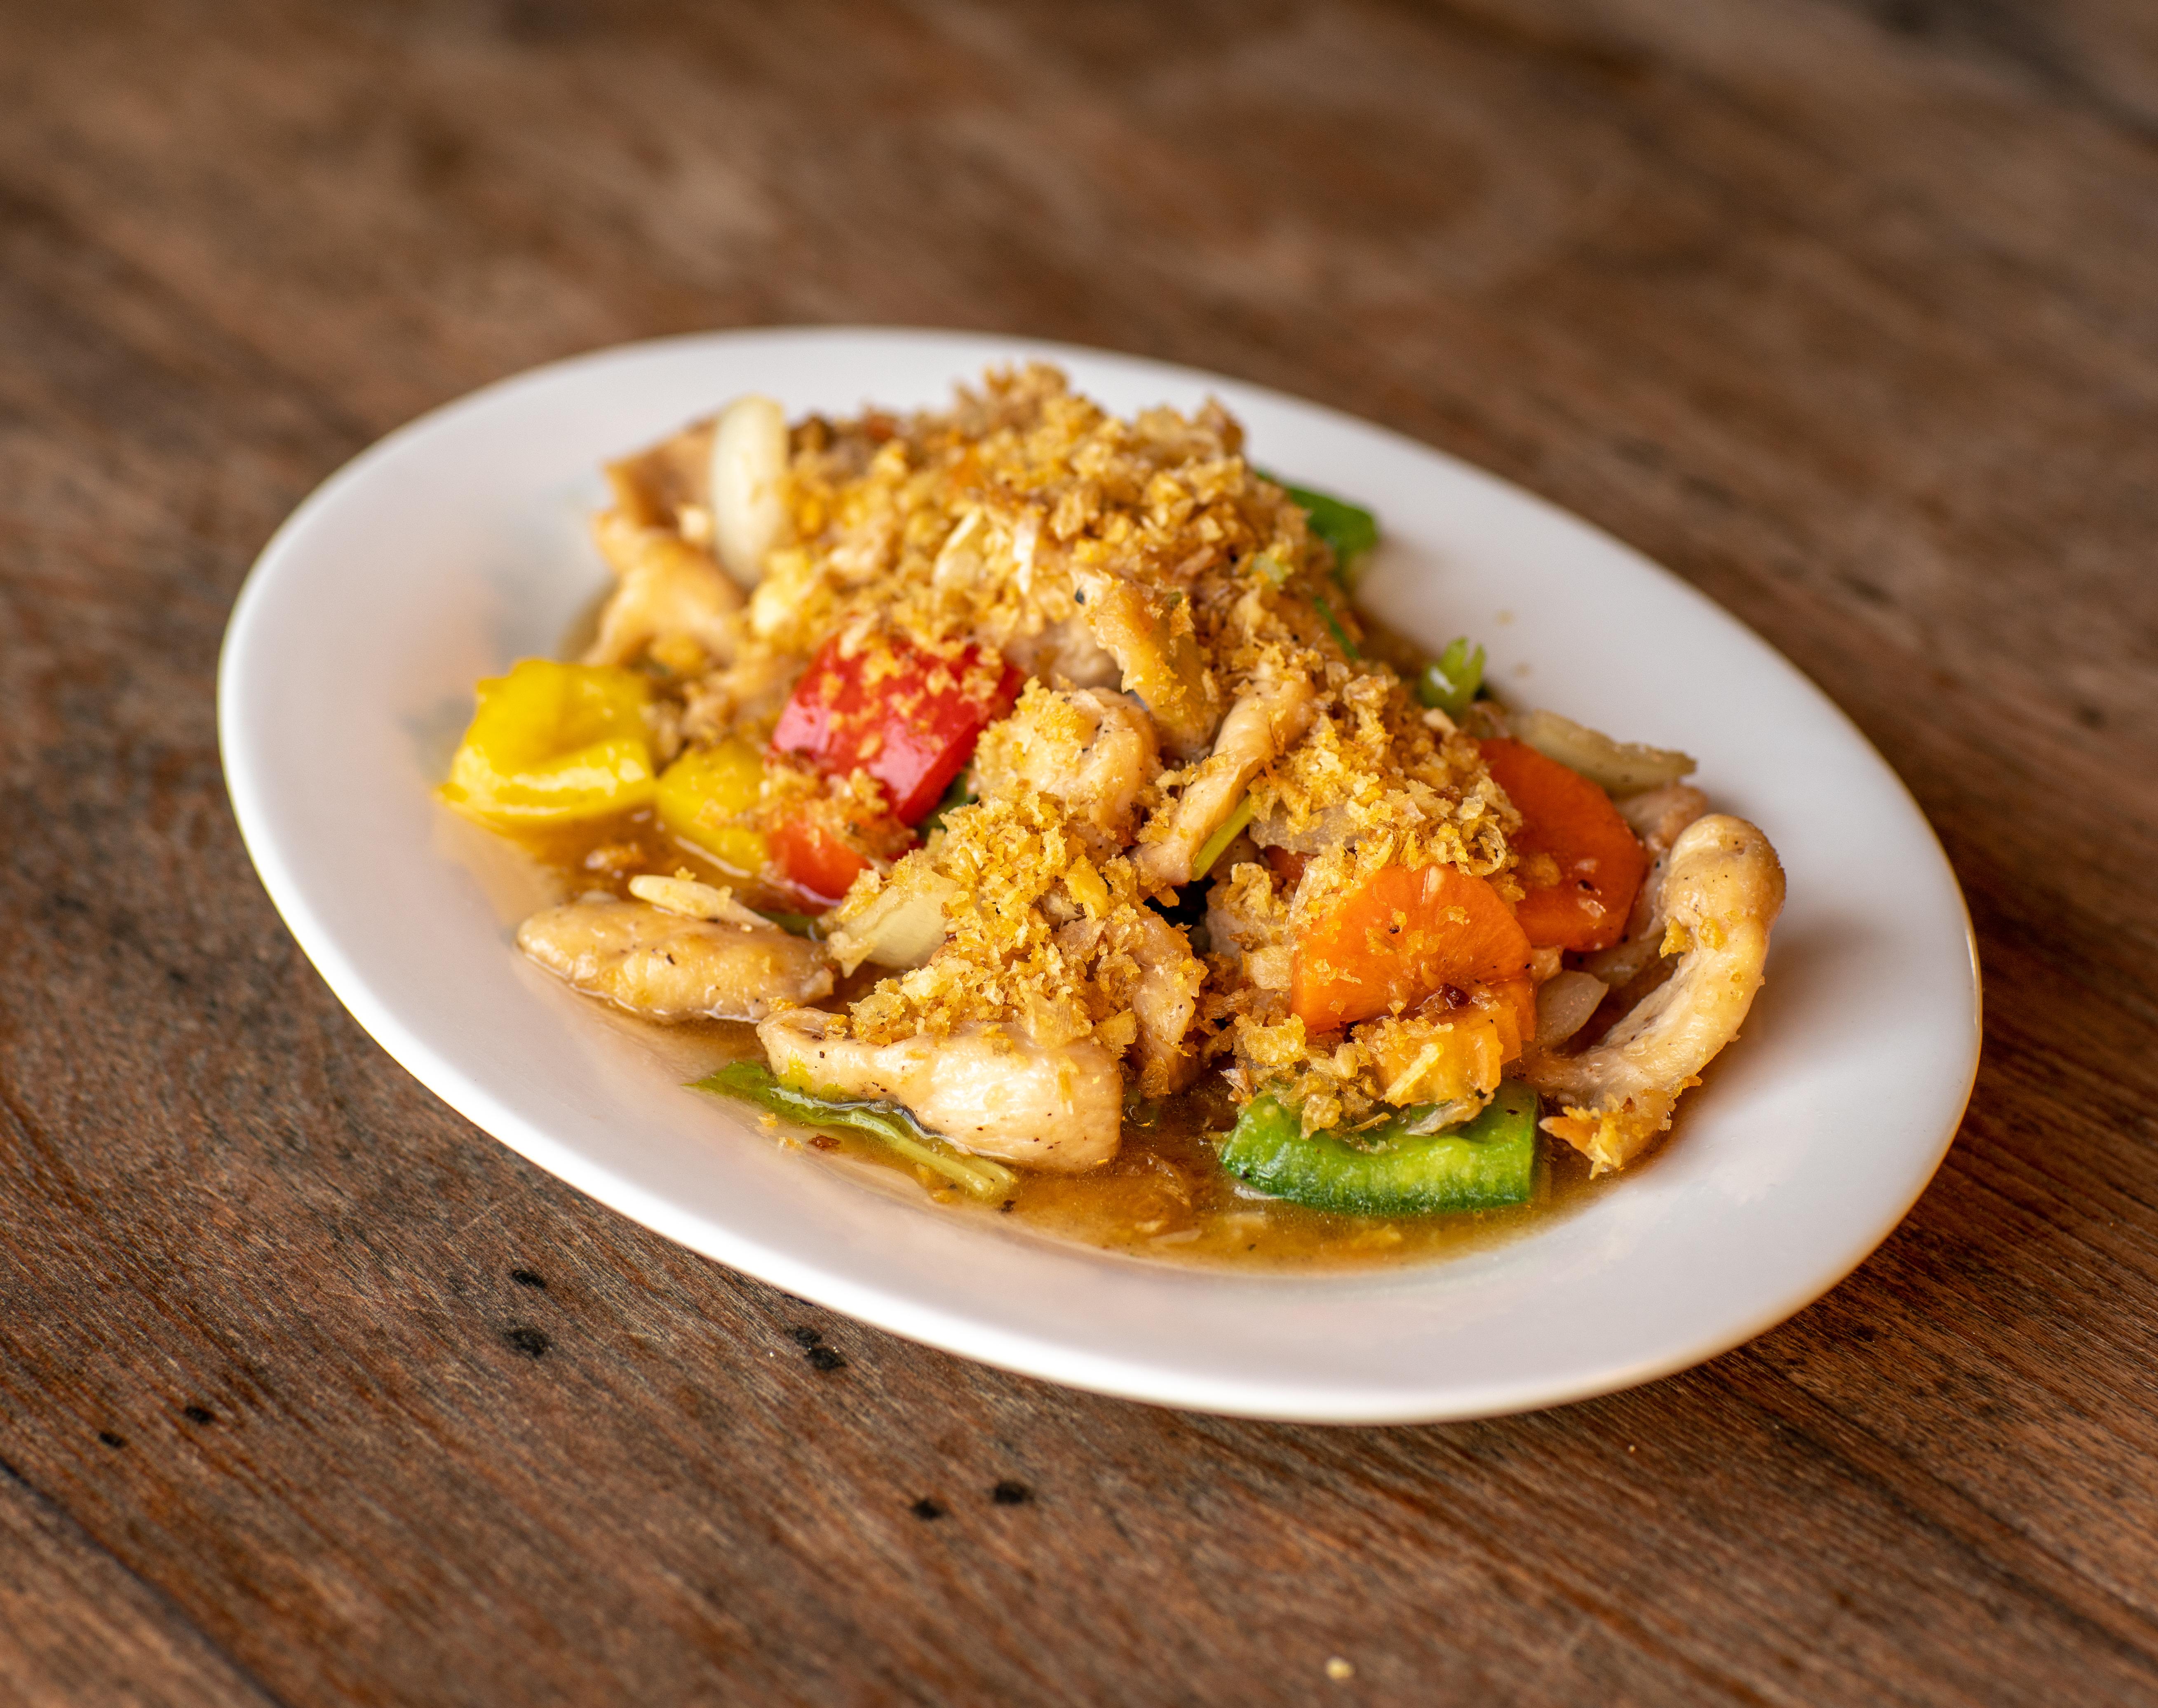 Stir fried Chicken/Pork or Seafood with garlic-pepper sauce